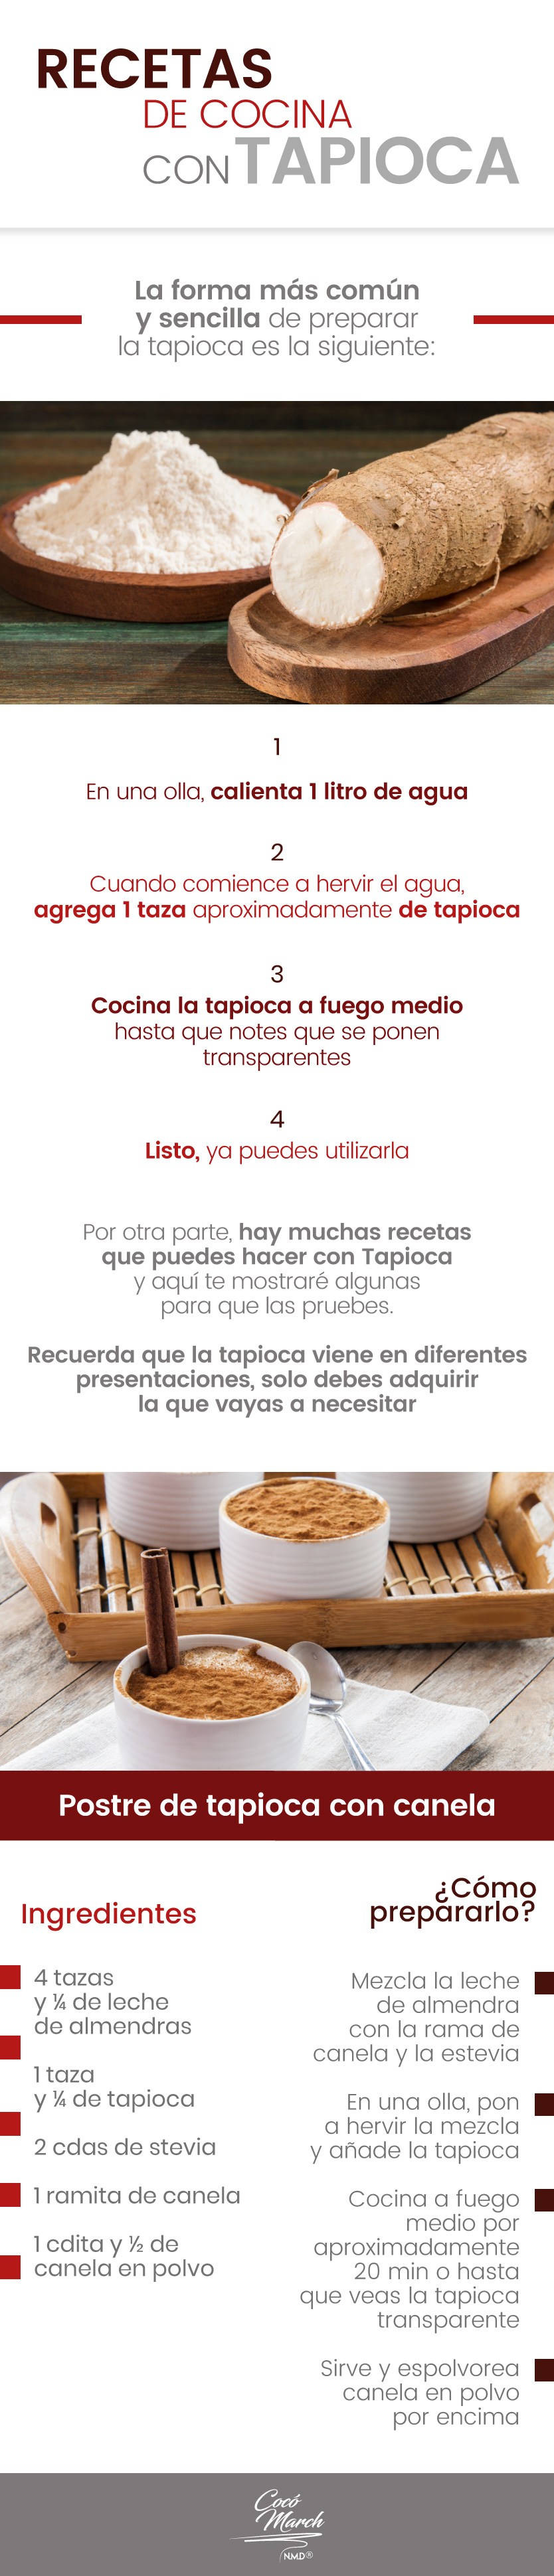 tapioca-recetas